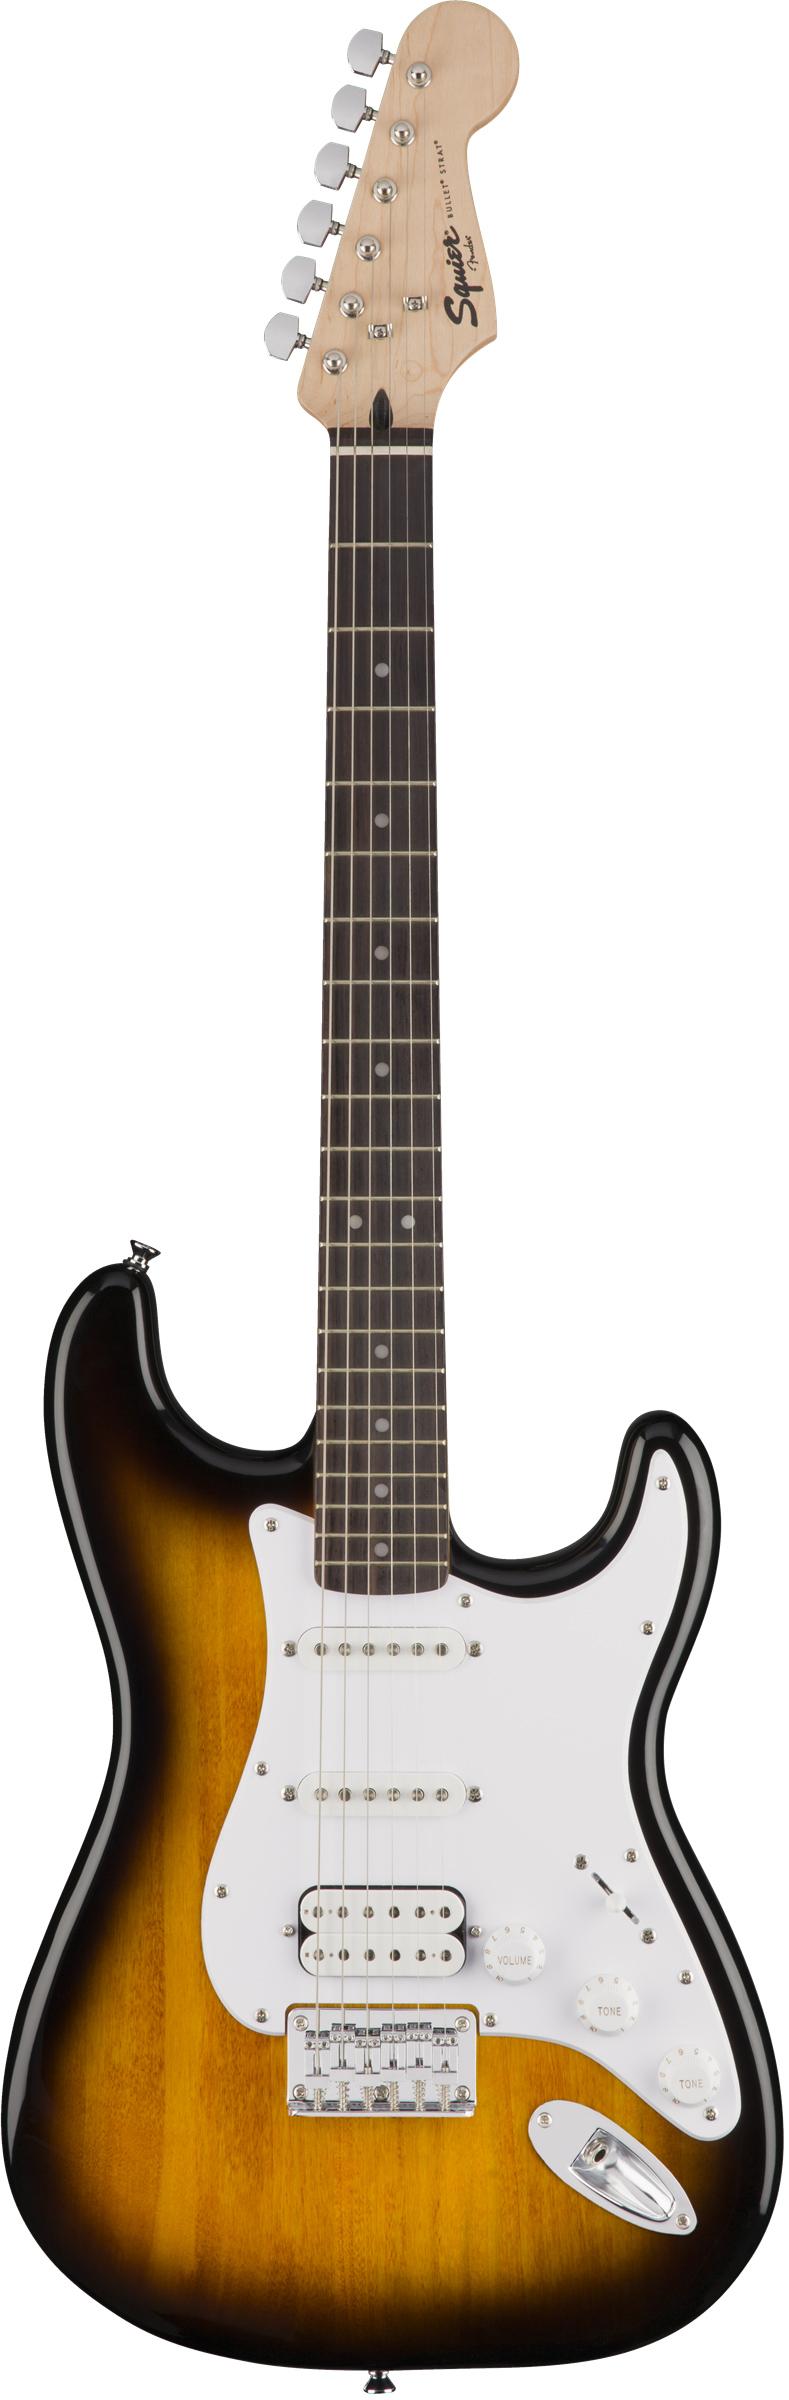 Squier by Fender Bullet Stratocaster HSS Hard Tail - Brown Sunburst